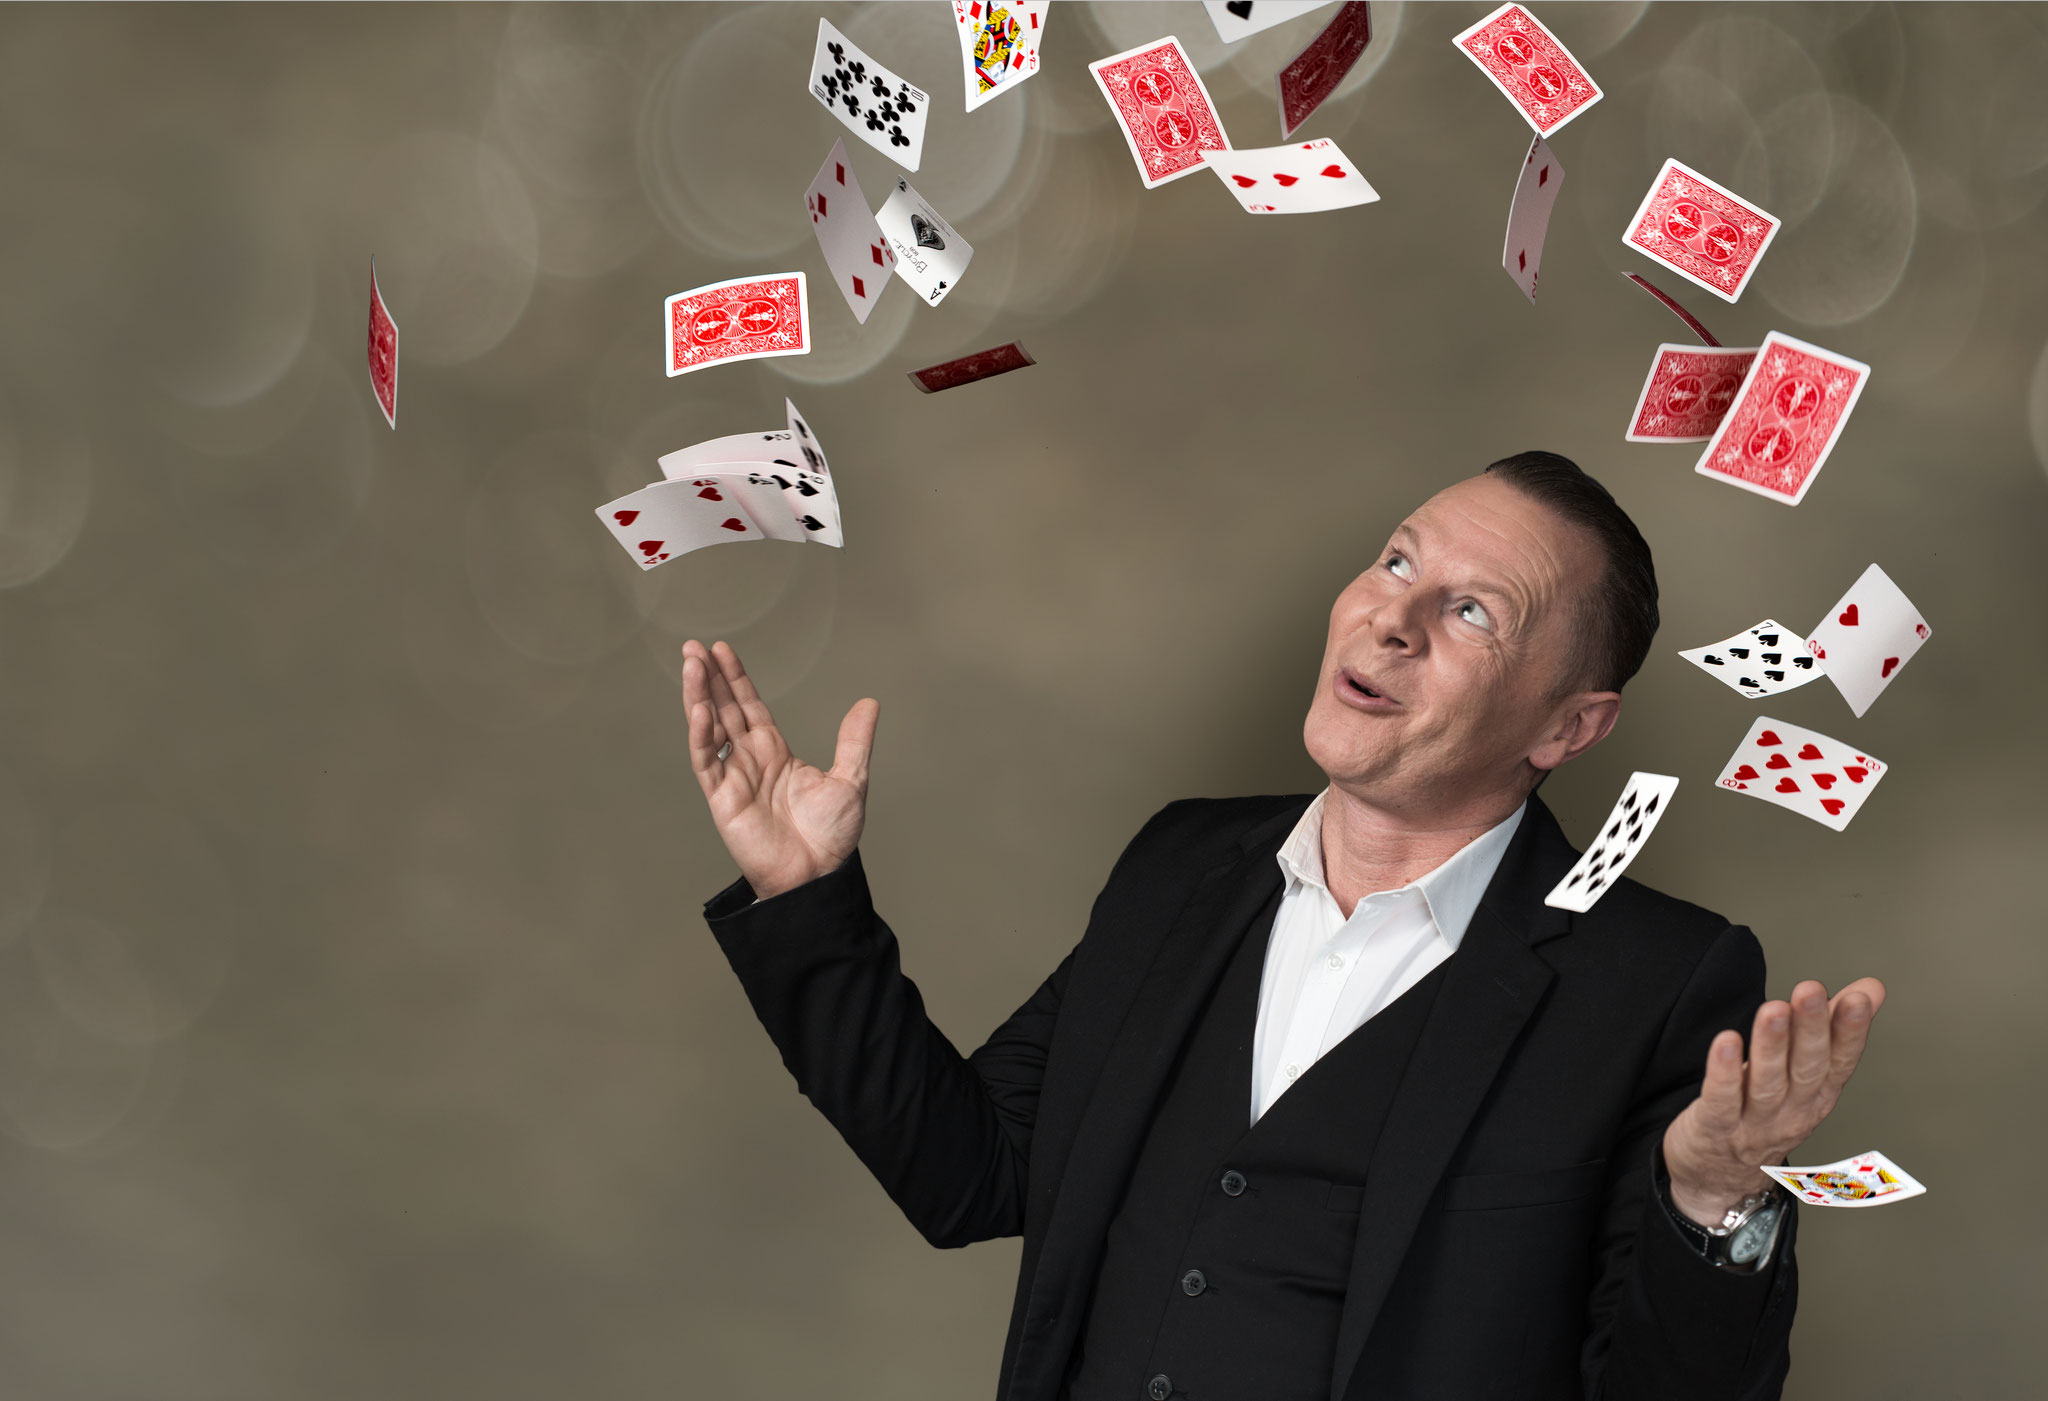 Michael Parlez - Zauberkünstler